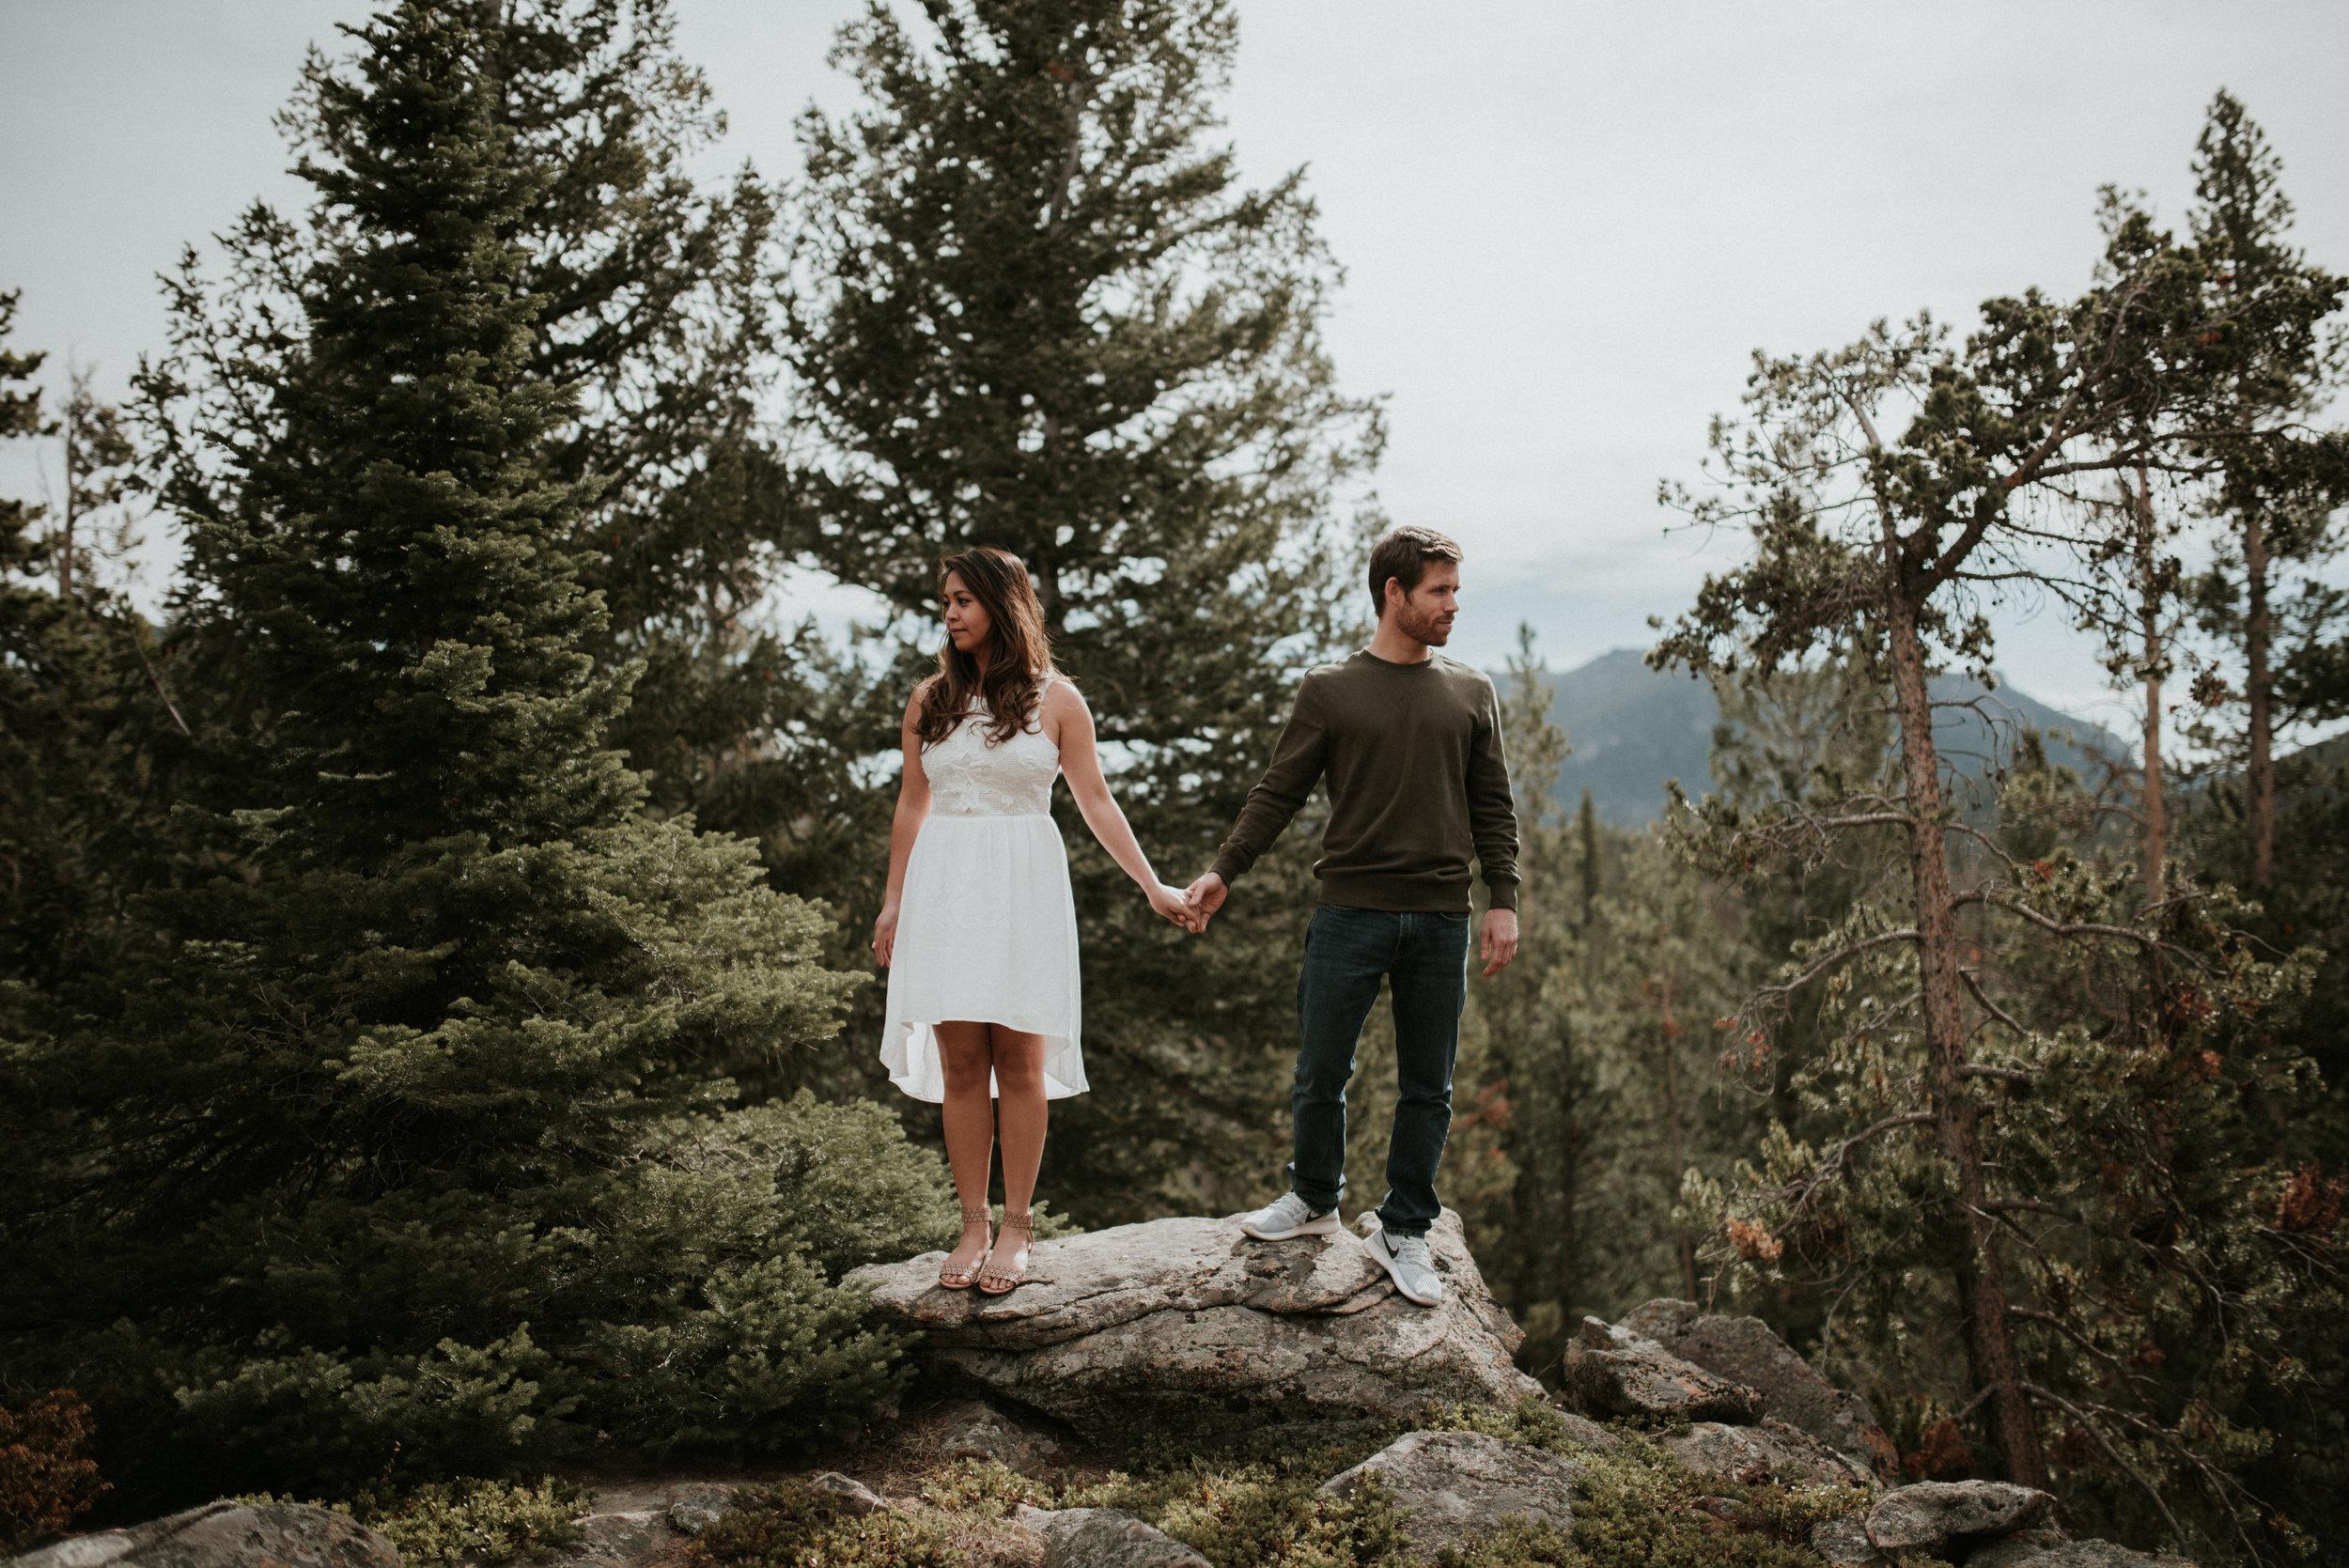 Zach&Rosalie Rocky Mountain National Park Engagement Denver Colorado Rocky Mountain Wedding Photographer00020.jpg